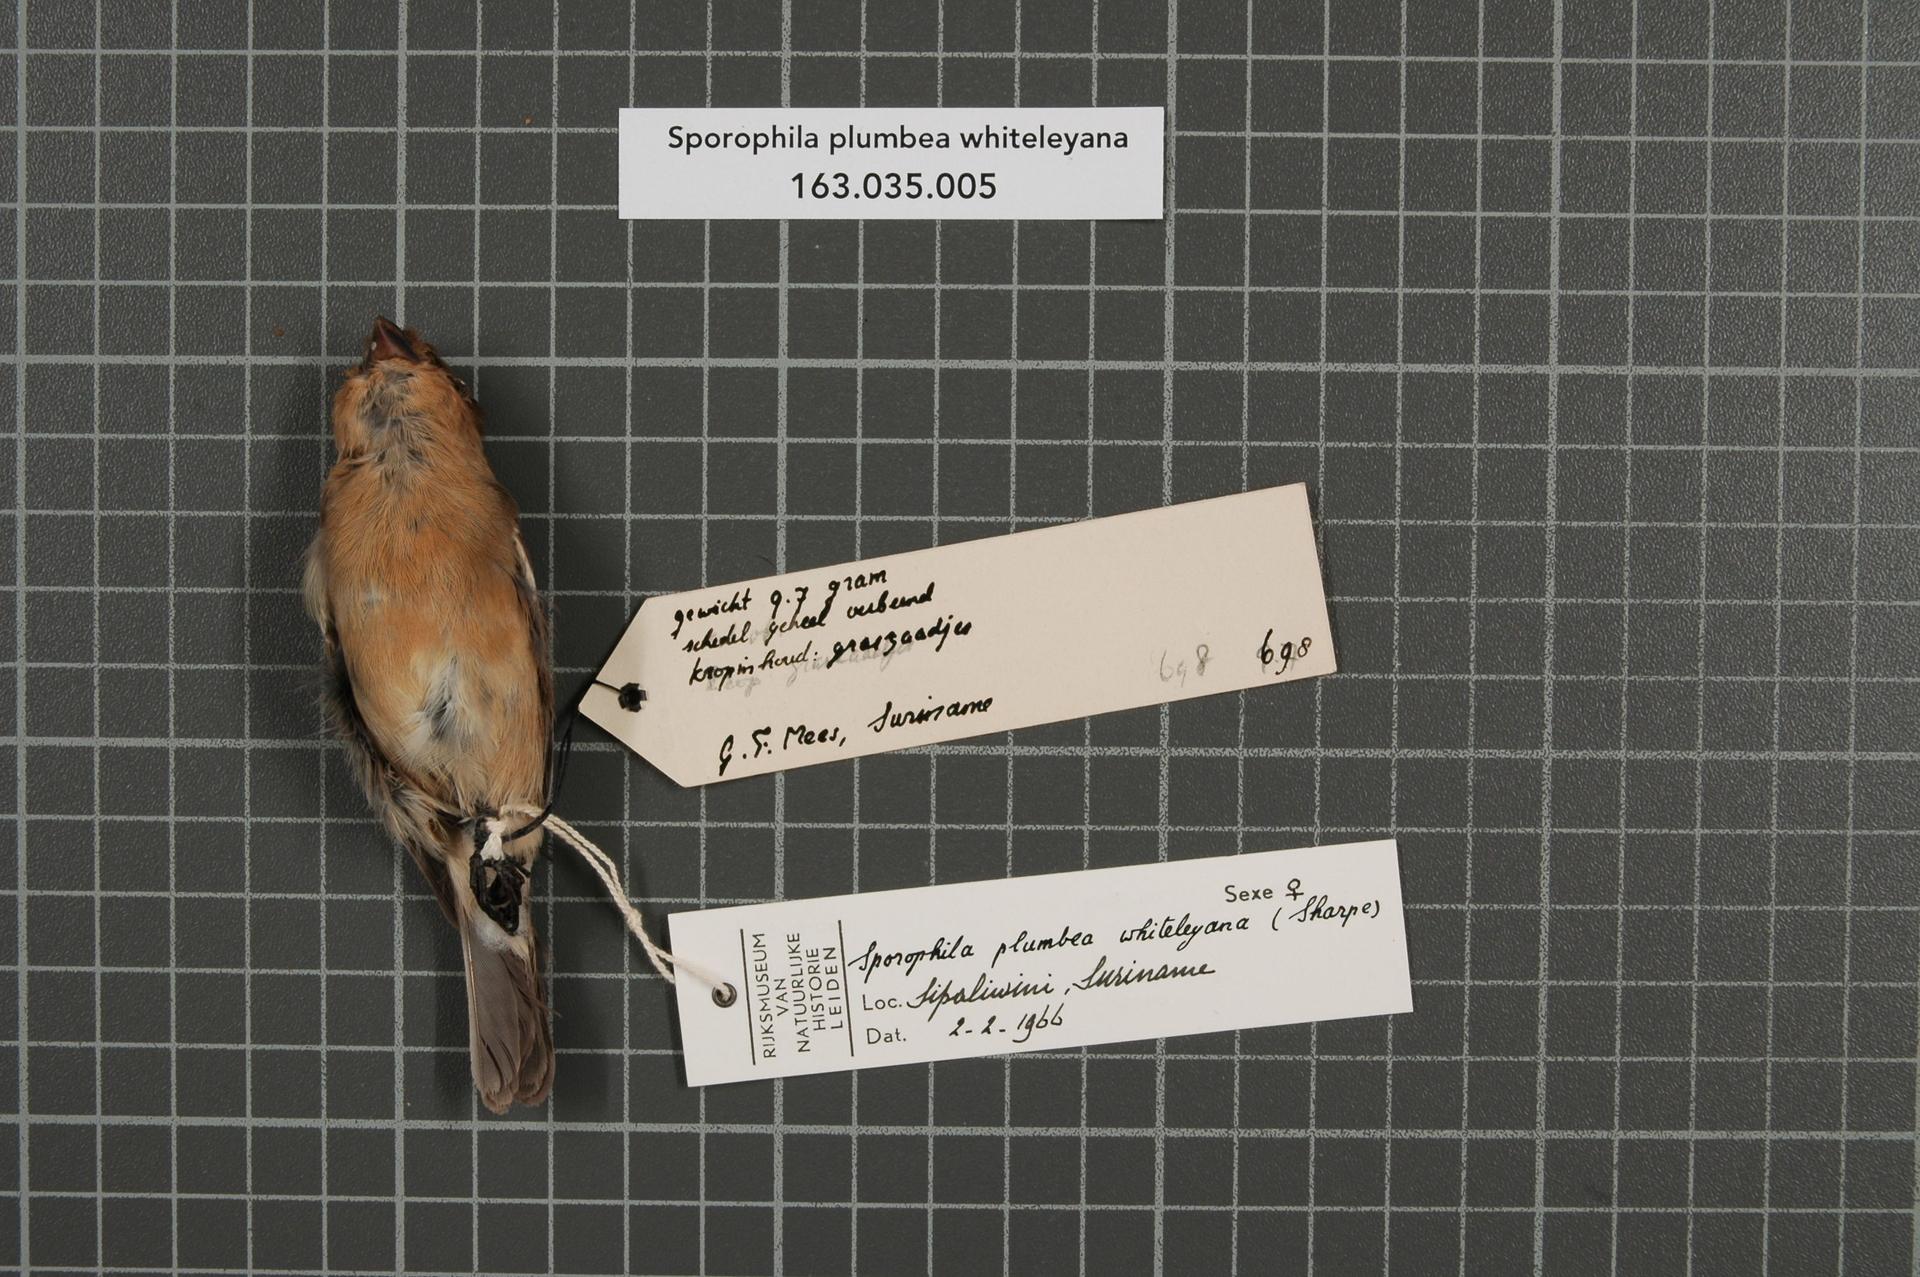 RMNH.AVES.39229   Sporophila plumbea whiteleyana (Sharpe, 1888)